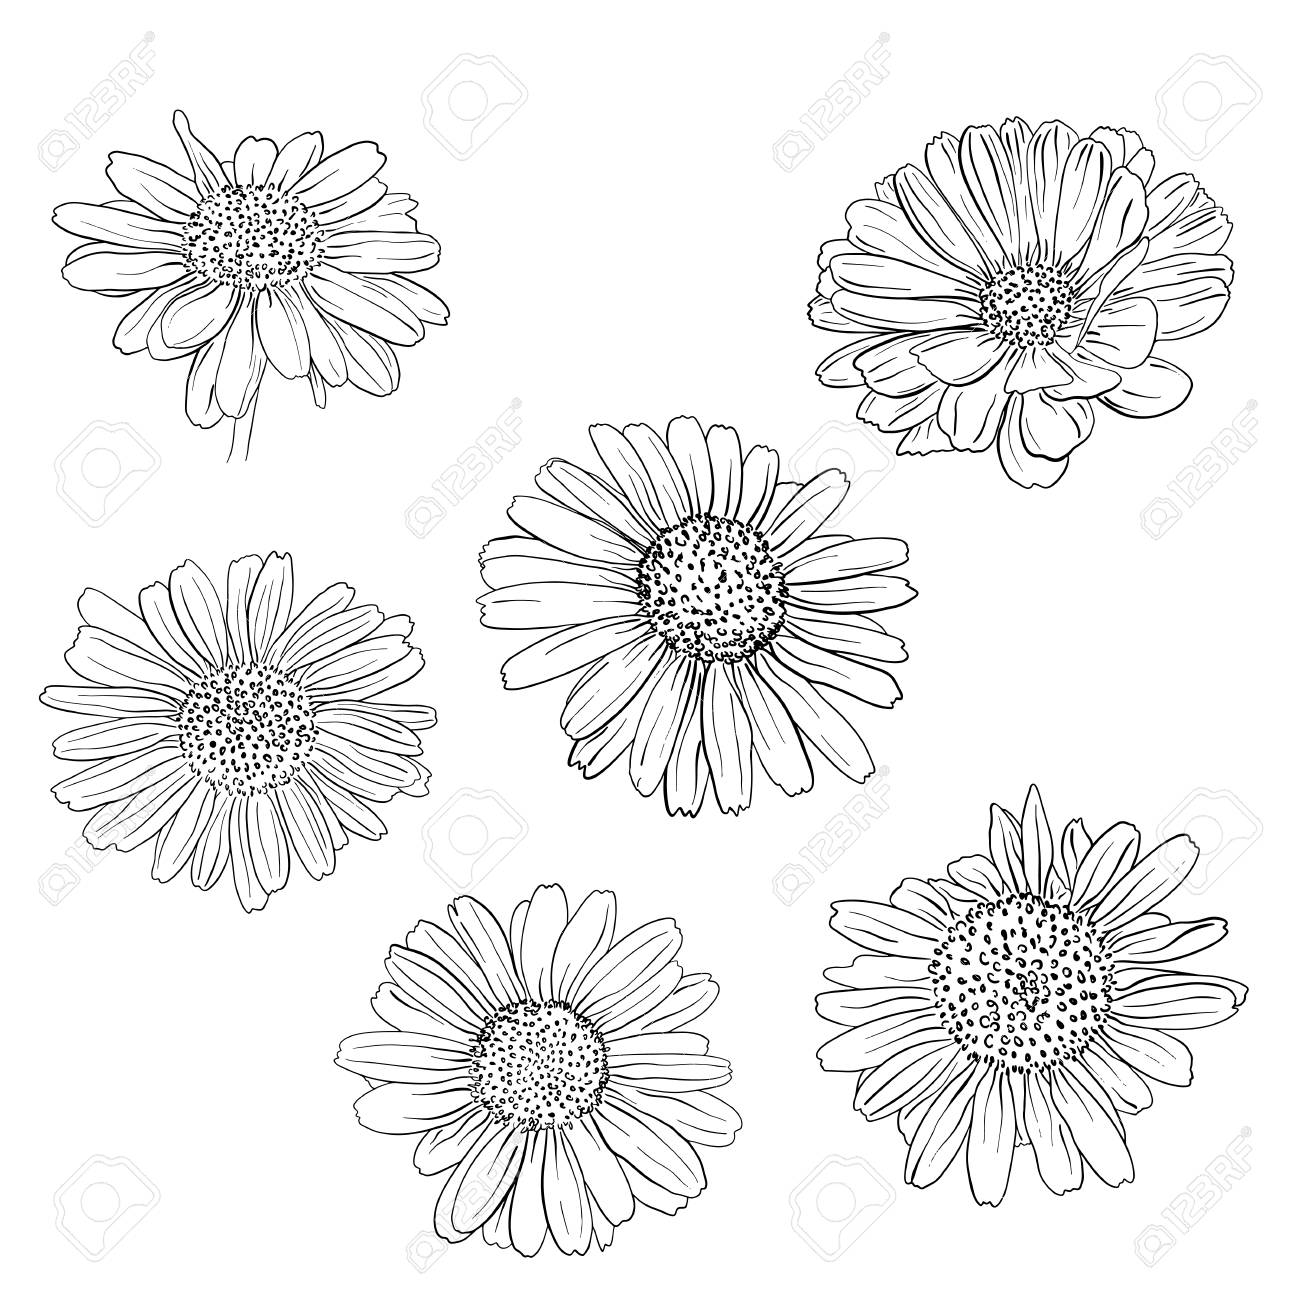 1300x1300 Daisy Hand Drawn Sketches Set. Vector Llustration. Royalty Free